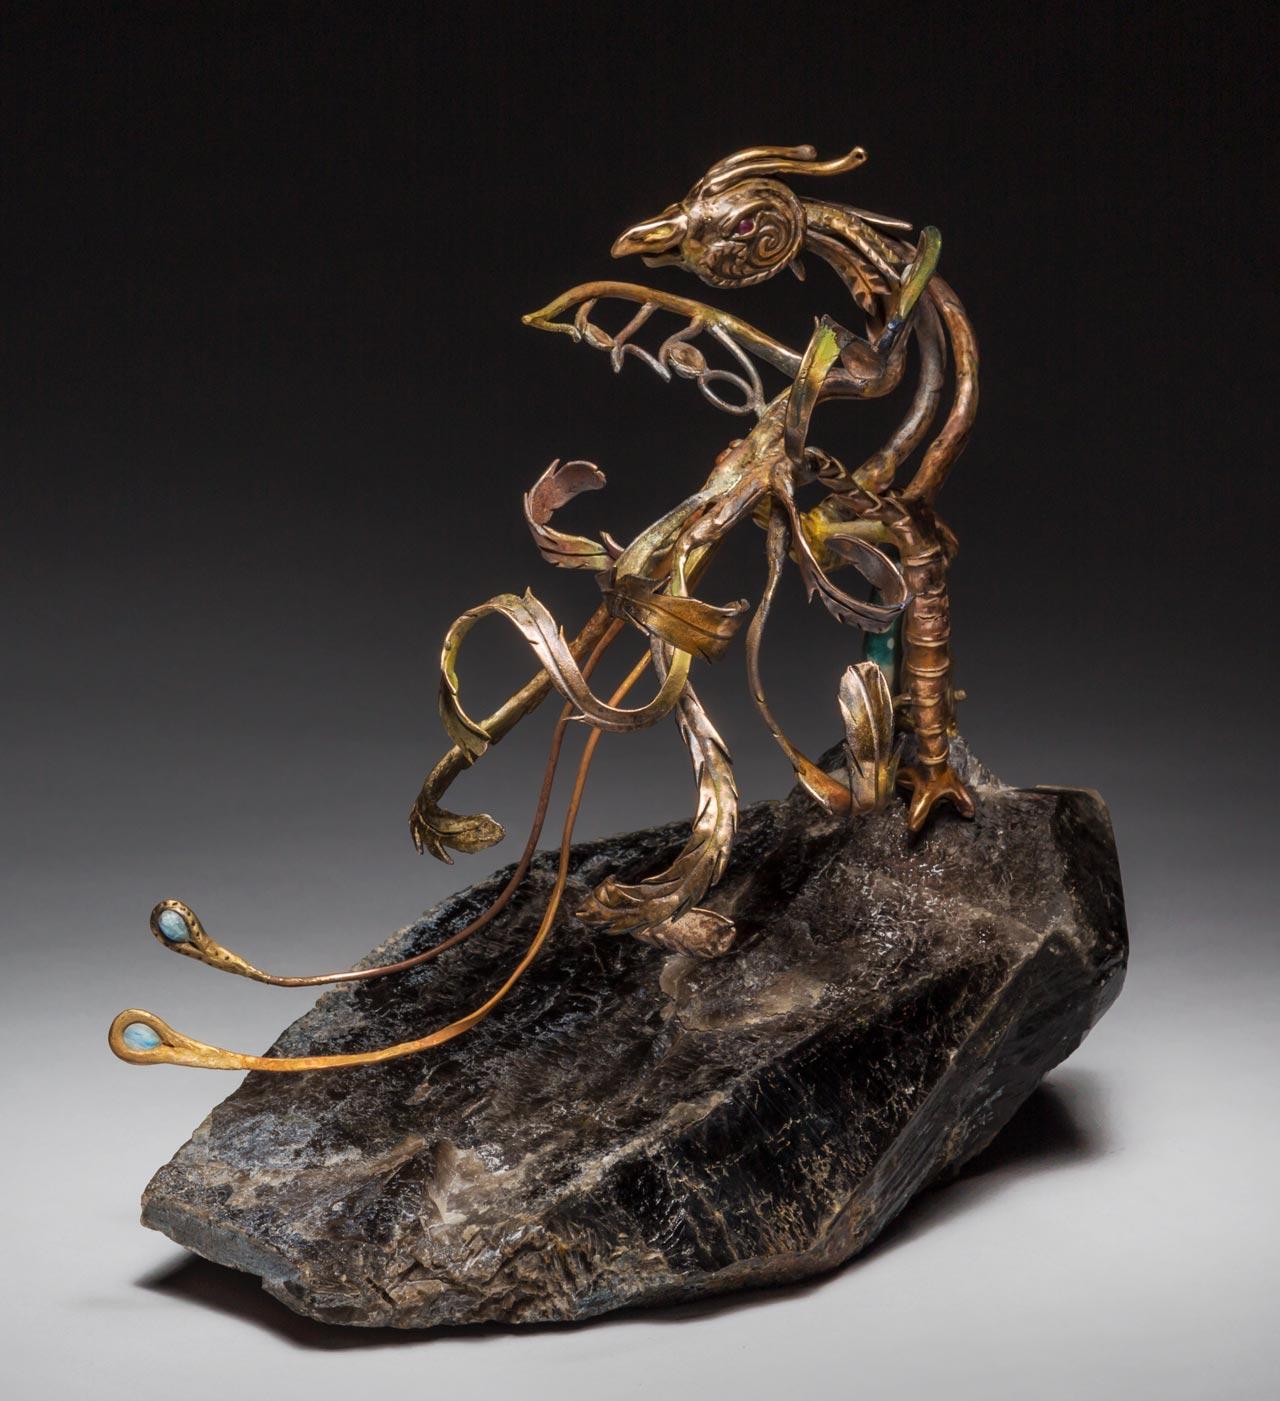 metal sculpture: phoenix back view